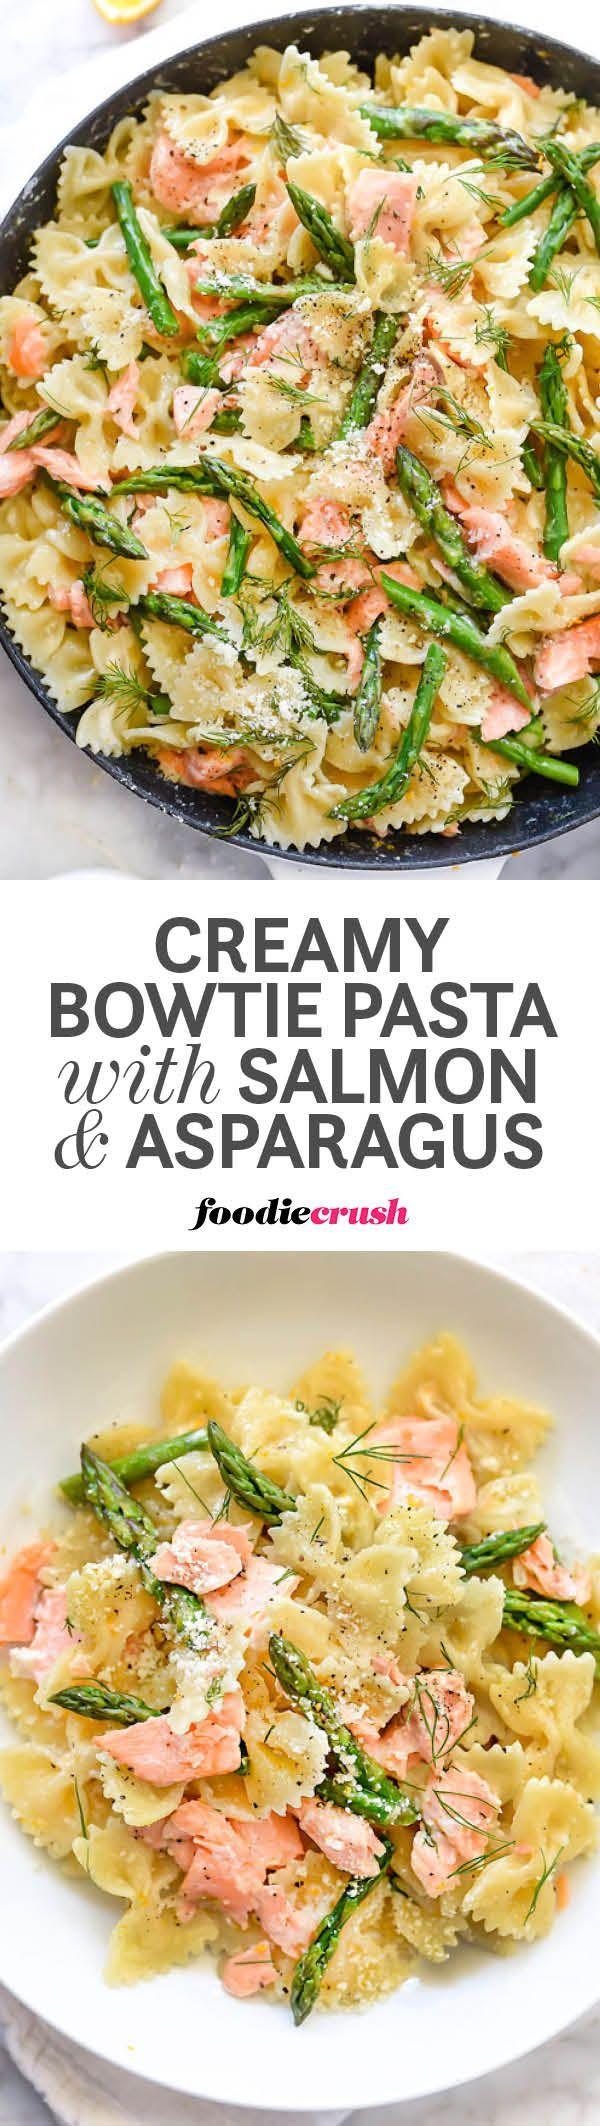 Http Www Food Com Recipe Pan Seared Shrimp With Garlic Lemon Butter